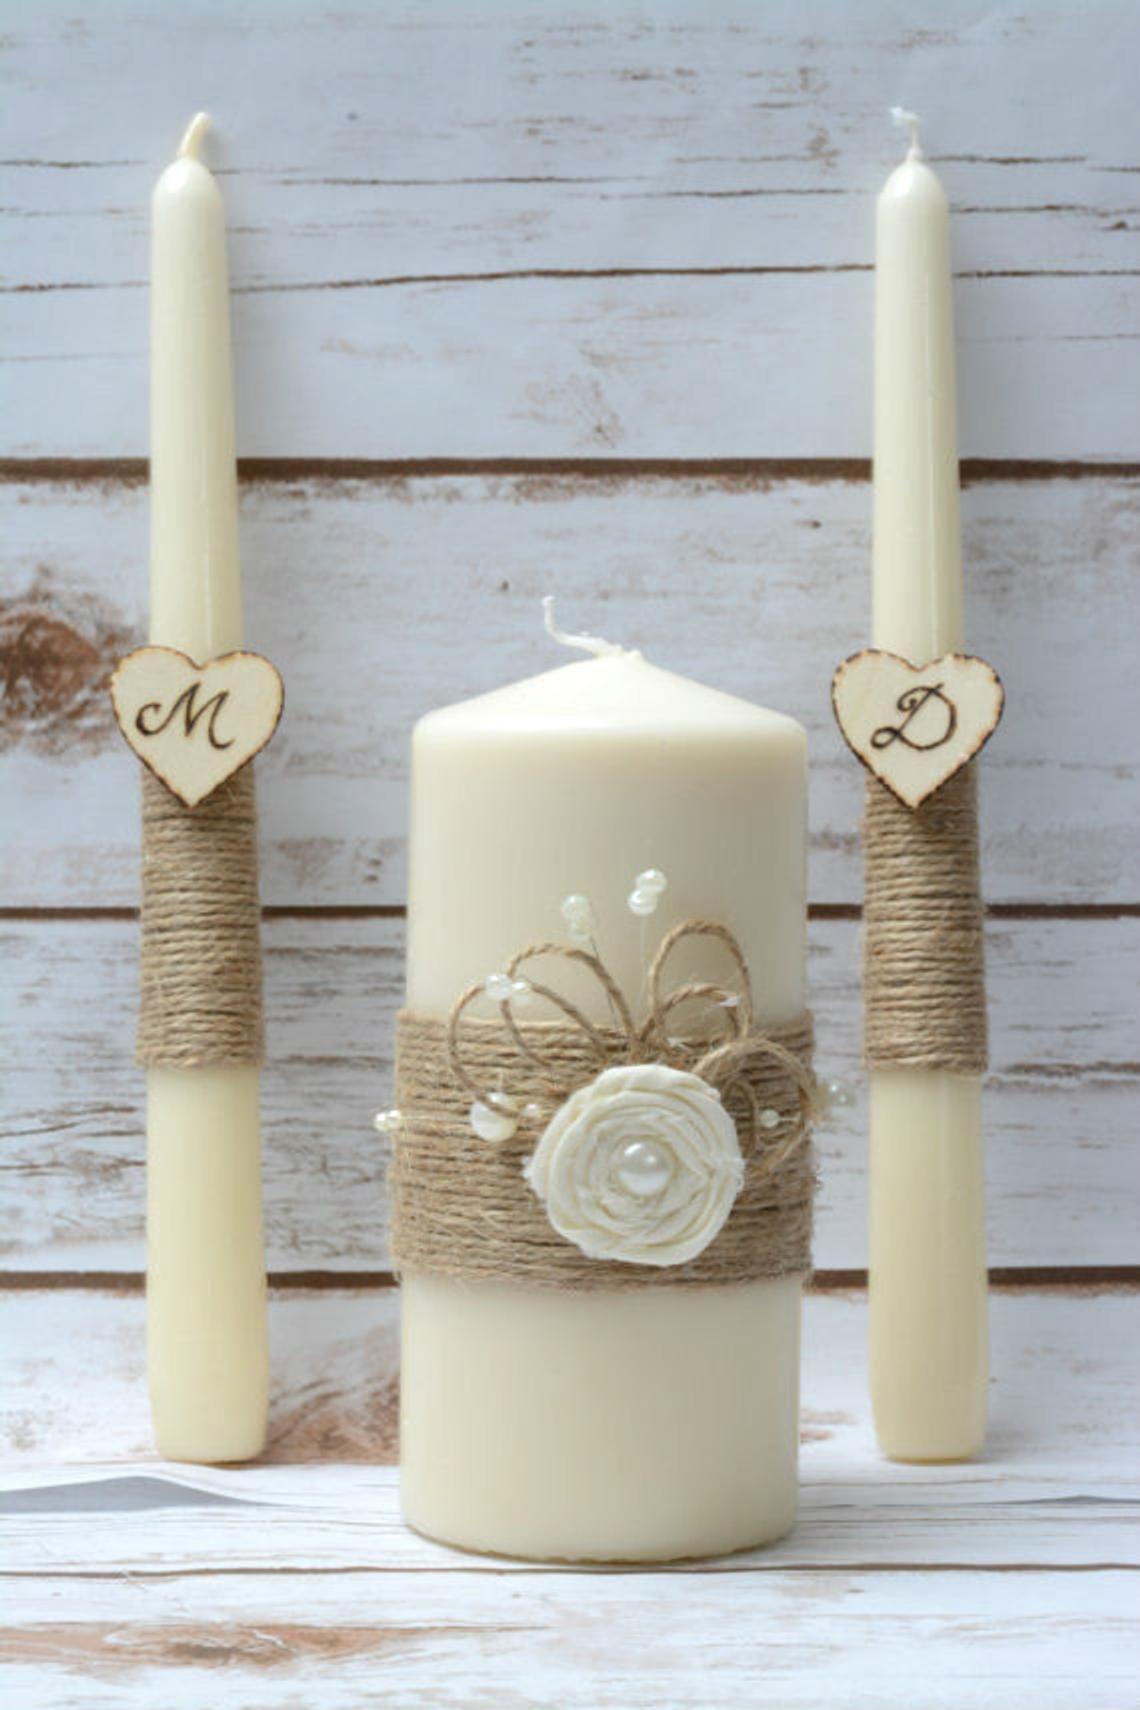 Pin Von Angelika Gellert Auf Basteln Rustikale Kerzen Kerzen